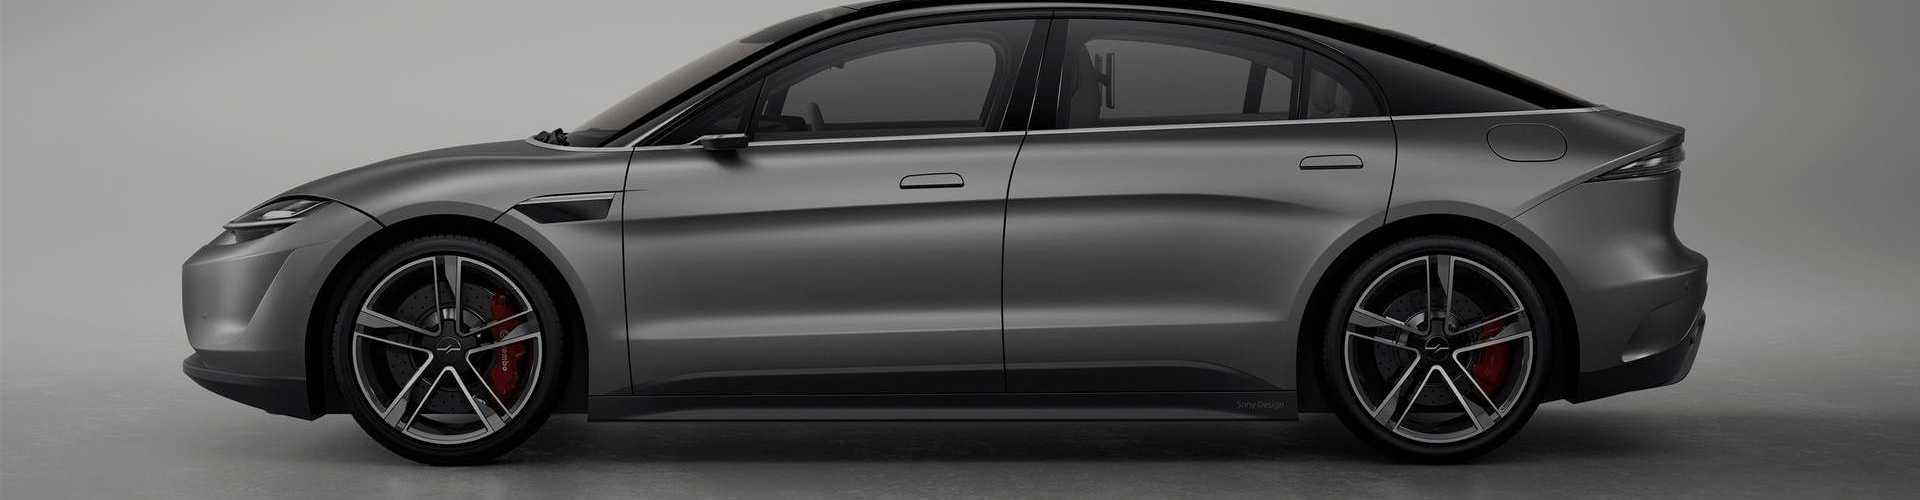 SUV alloy wheels manufacturer